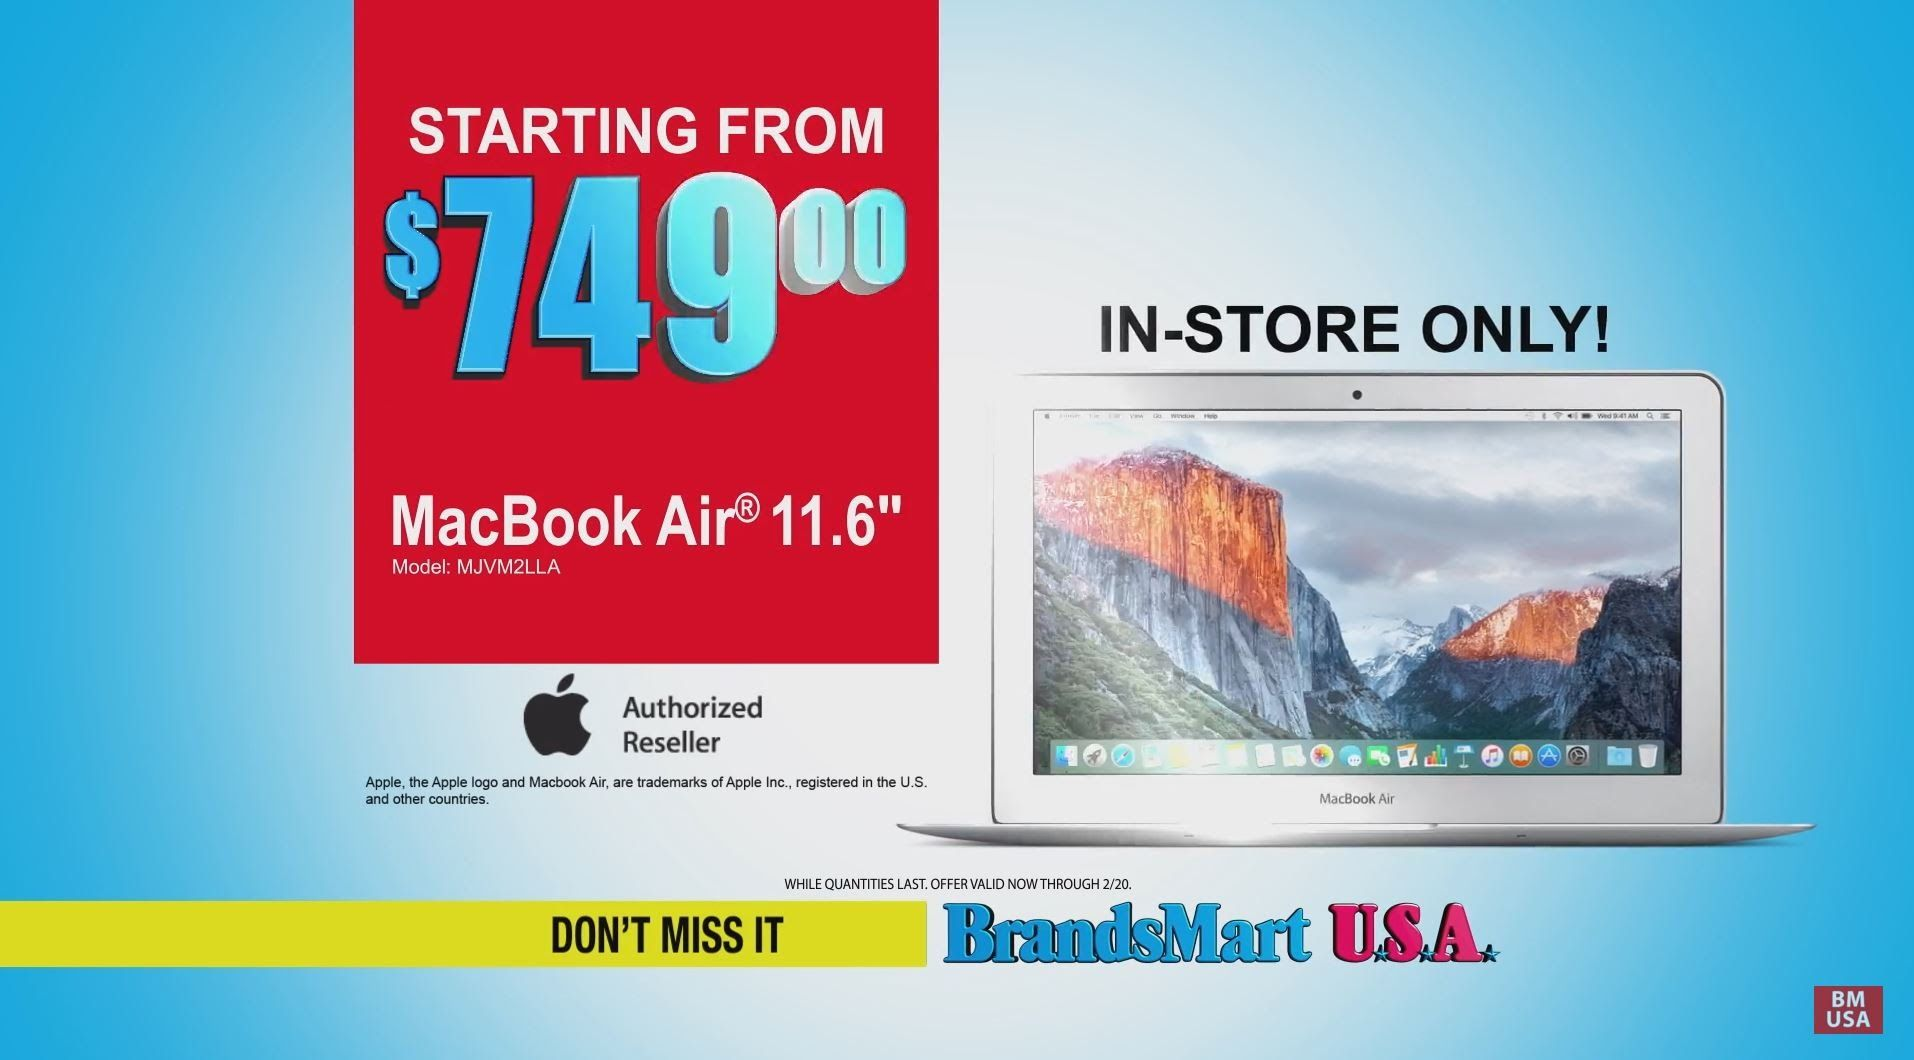 Presidents Day Sale Macbook Air, Stainless Steel